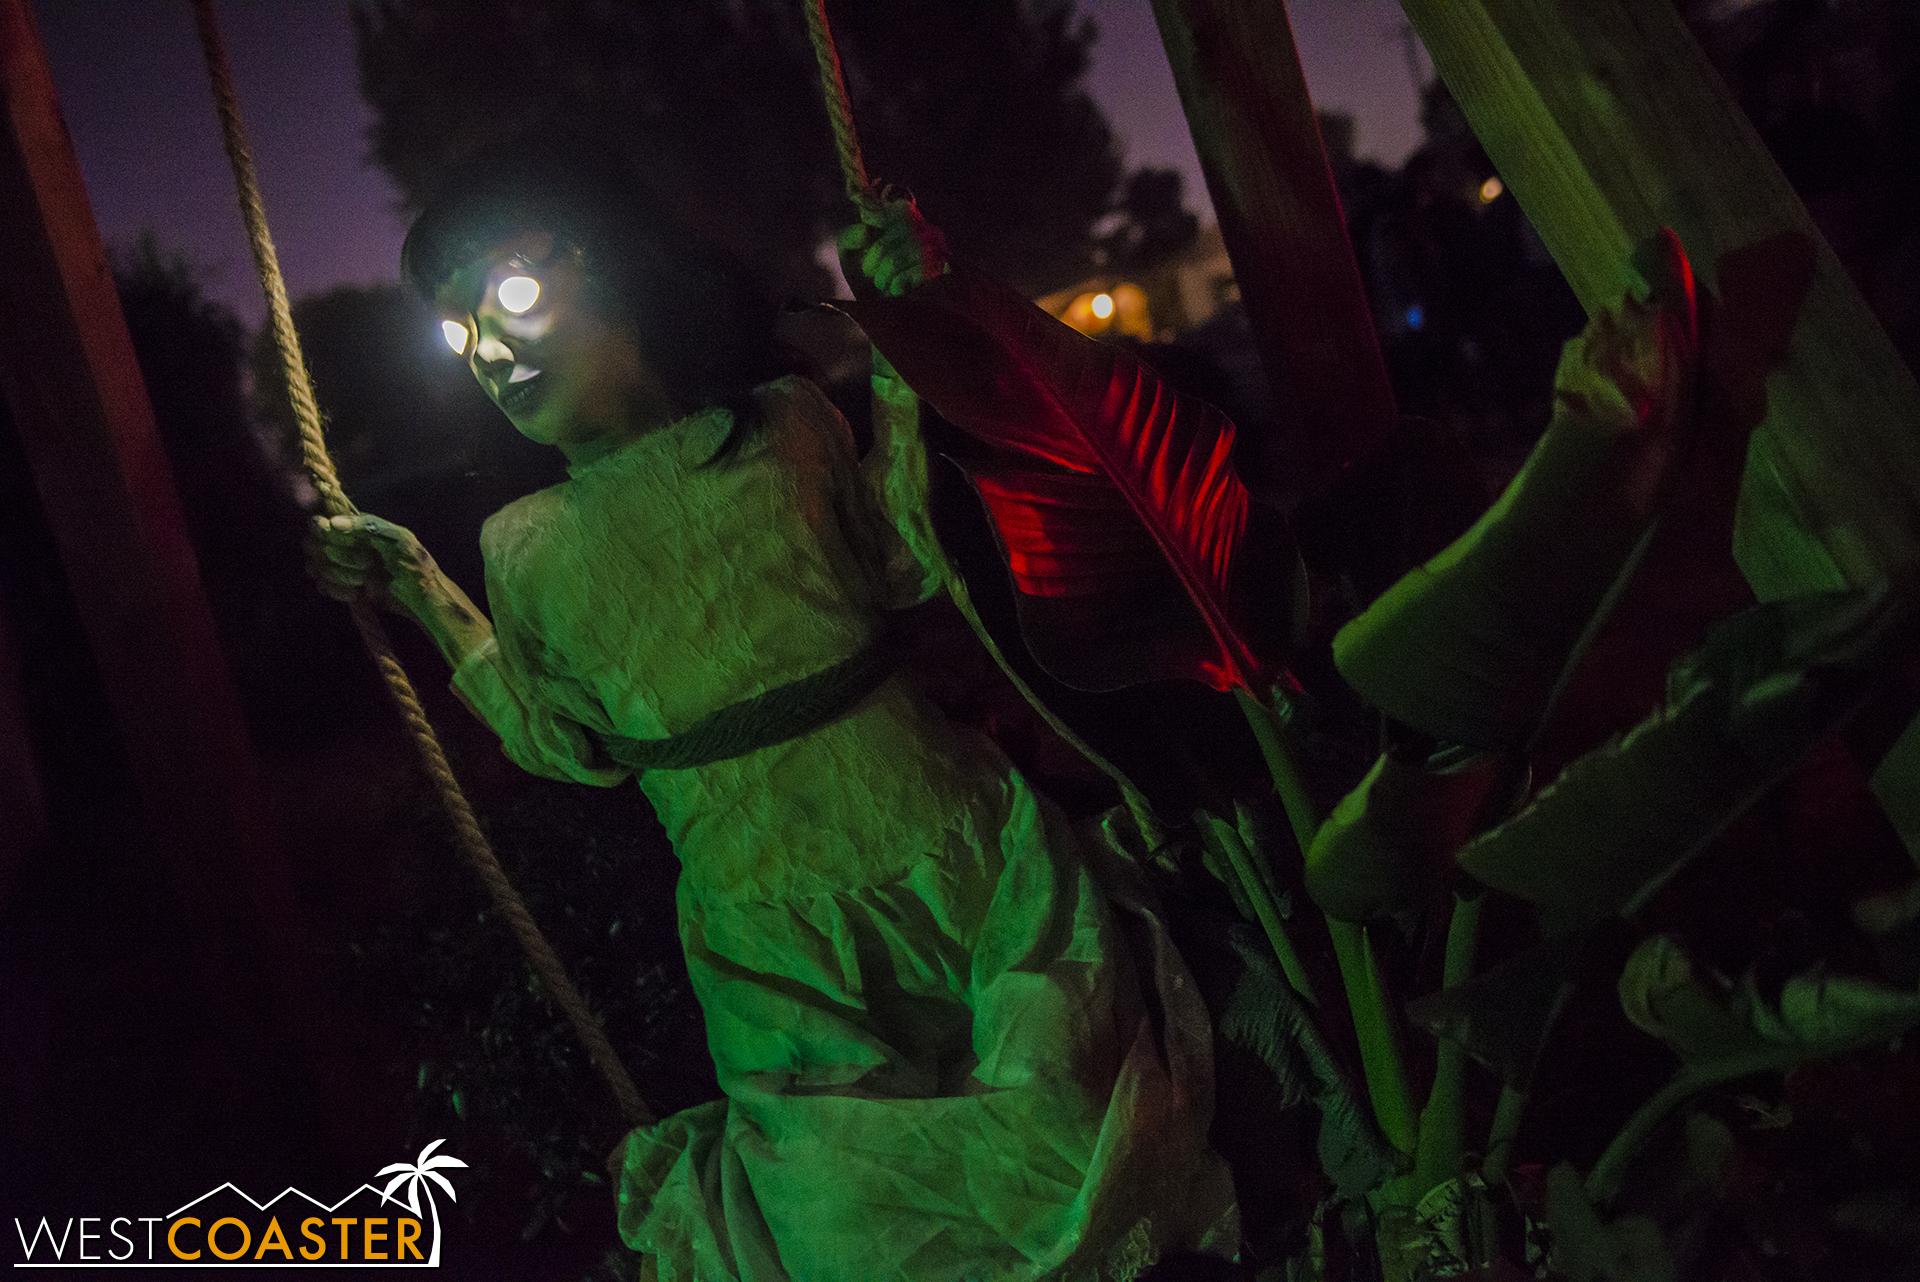 SpookyHollows-17_1031-0017.jpg